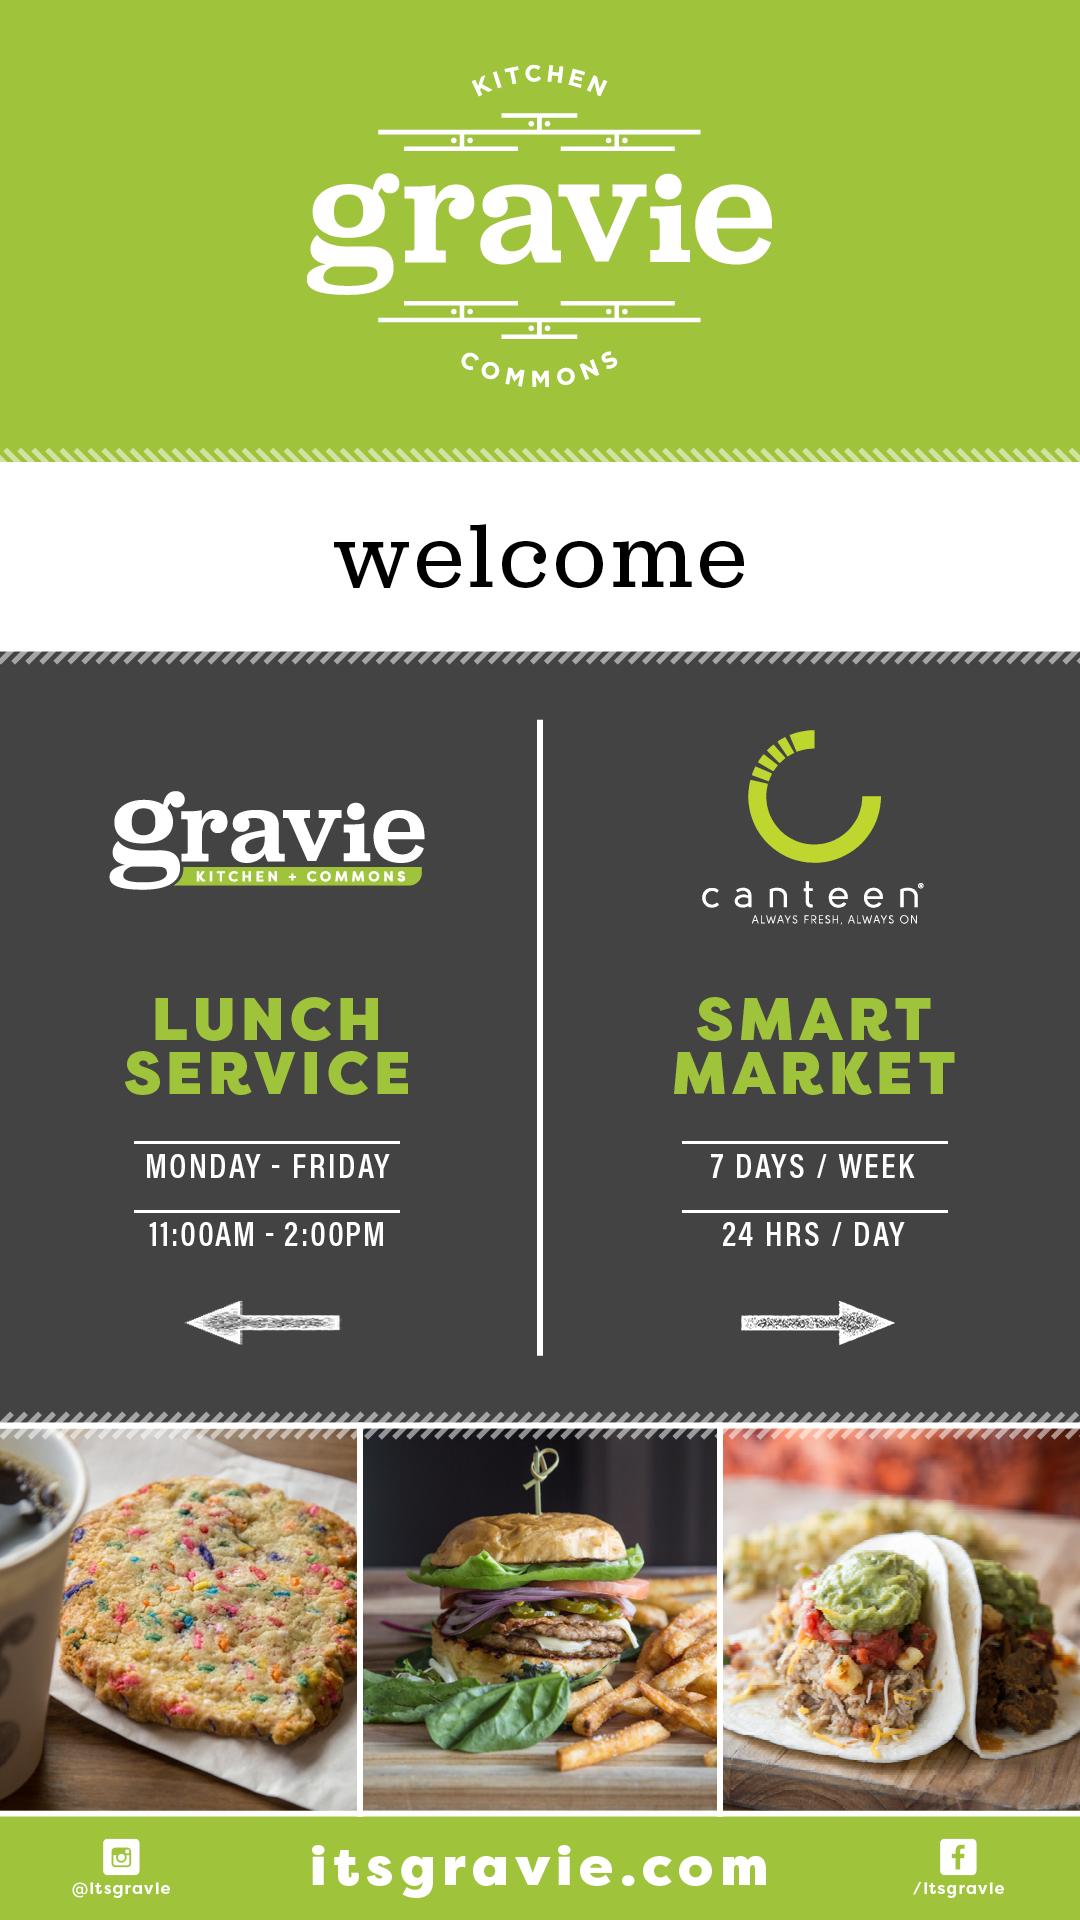 gravie-canteen-screen.png